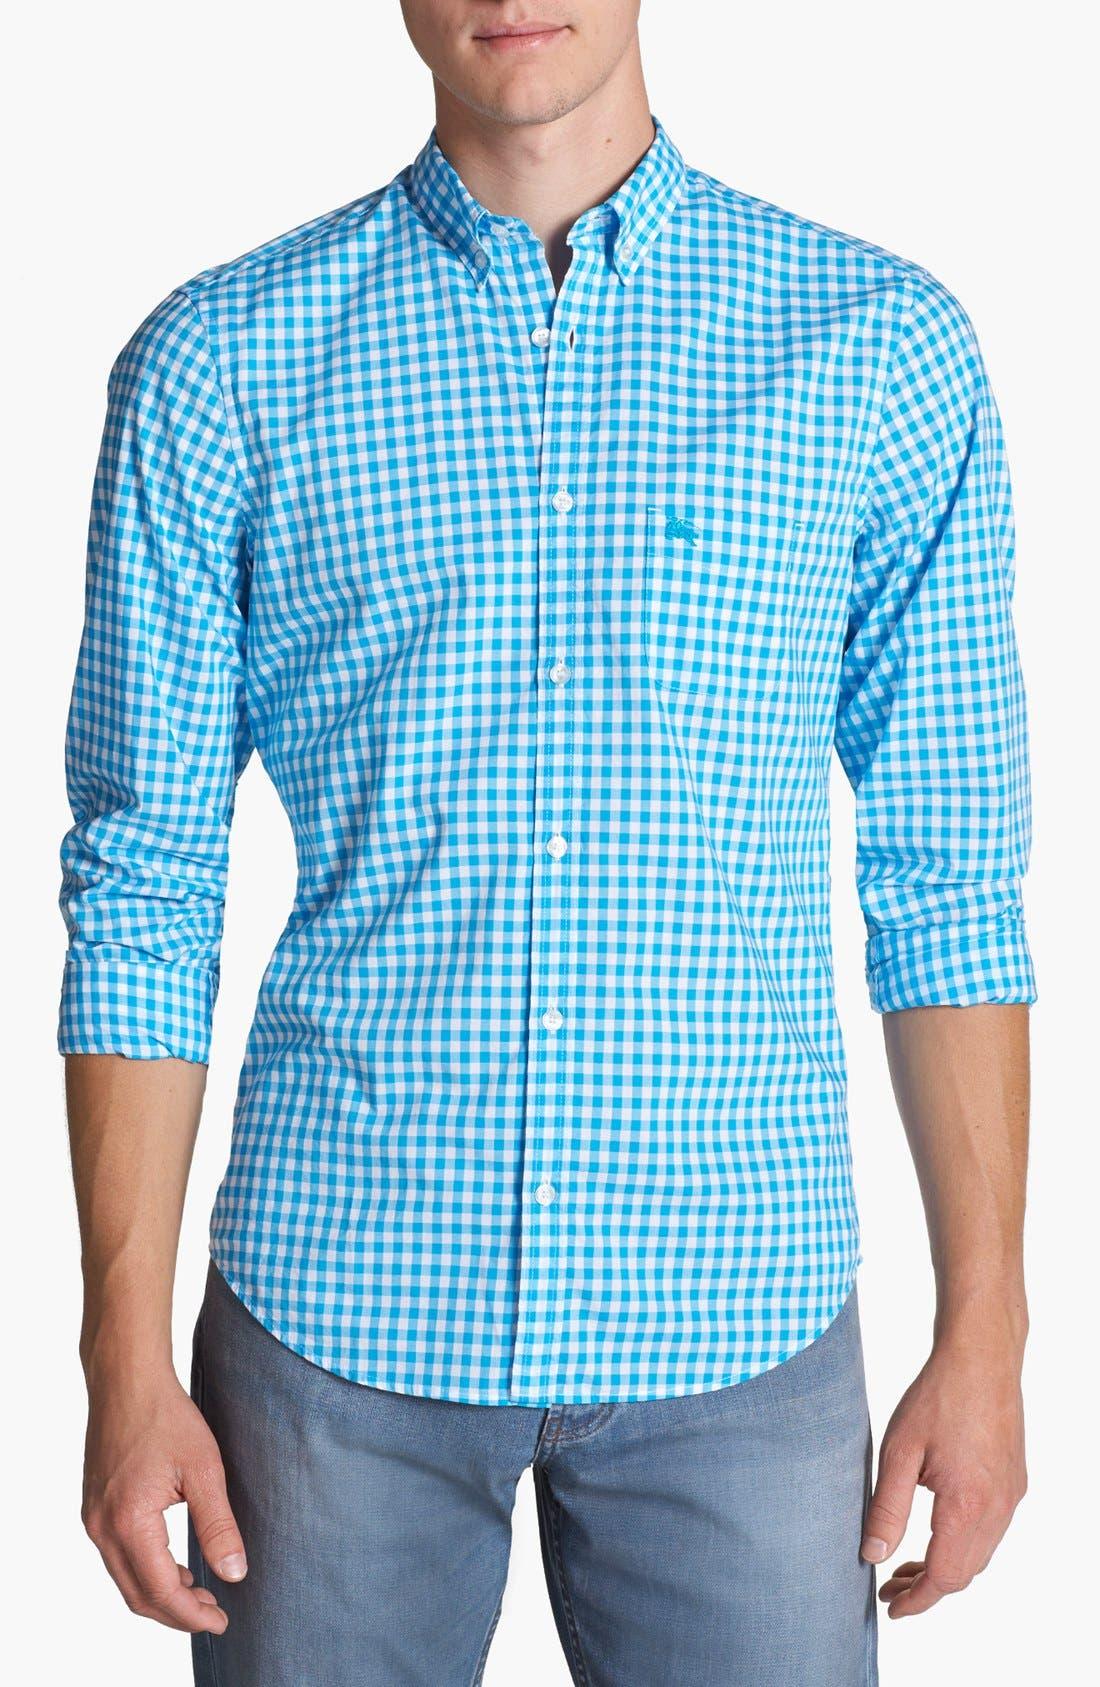 Main Image - Burberry Brit 'Adken' Gingham Trim Fit Cotton Sport Shirt